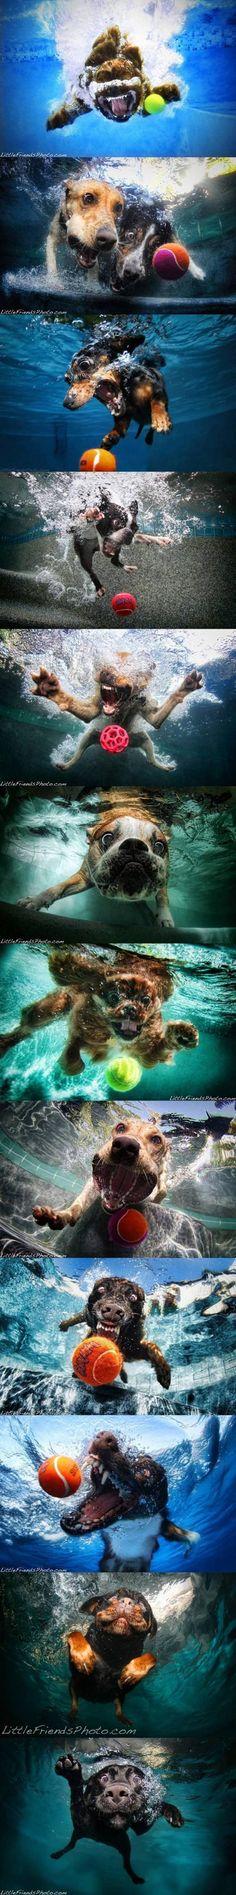 best photos ever!